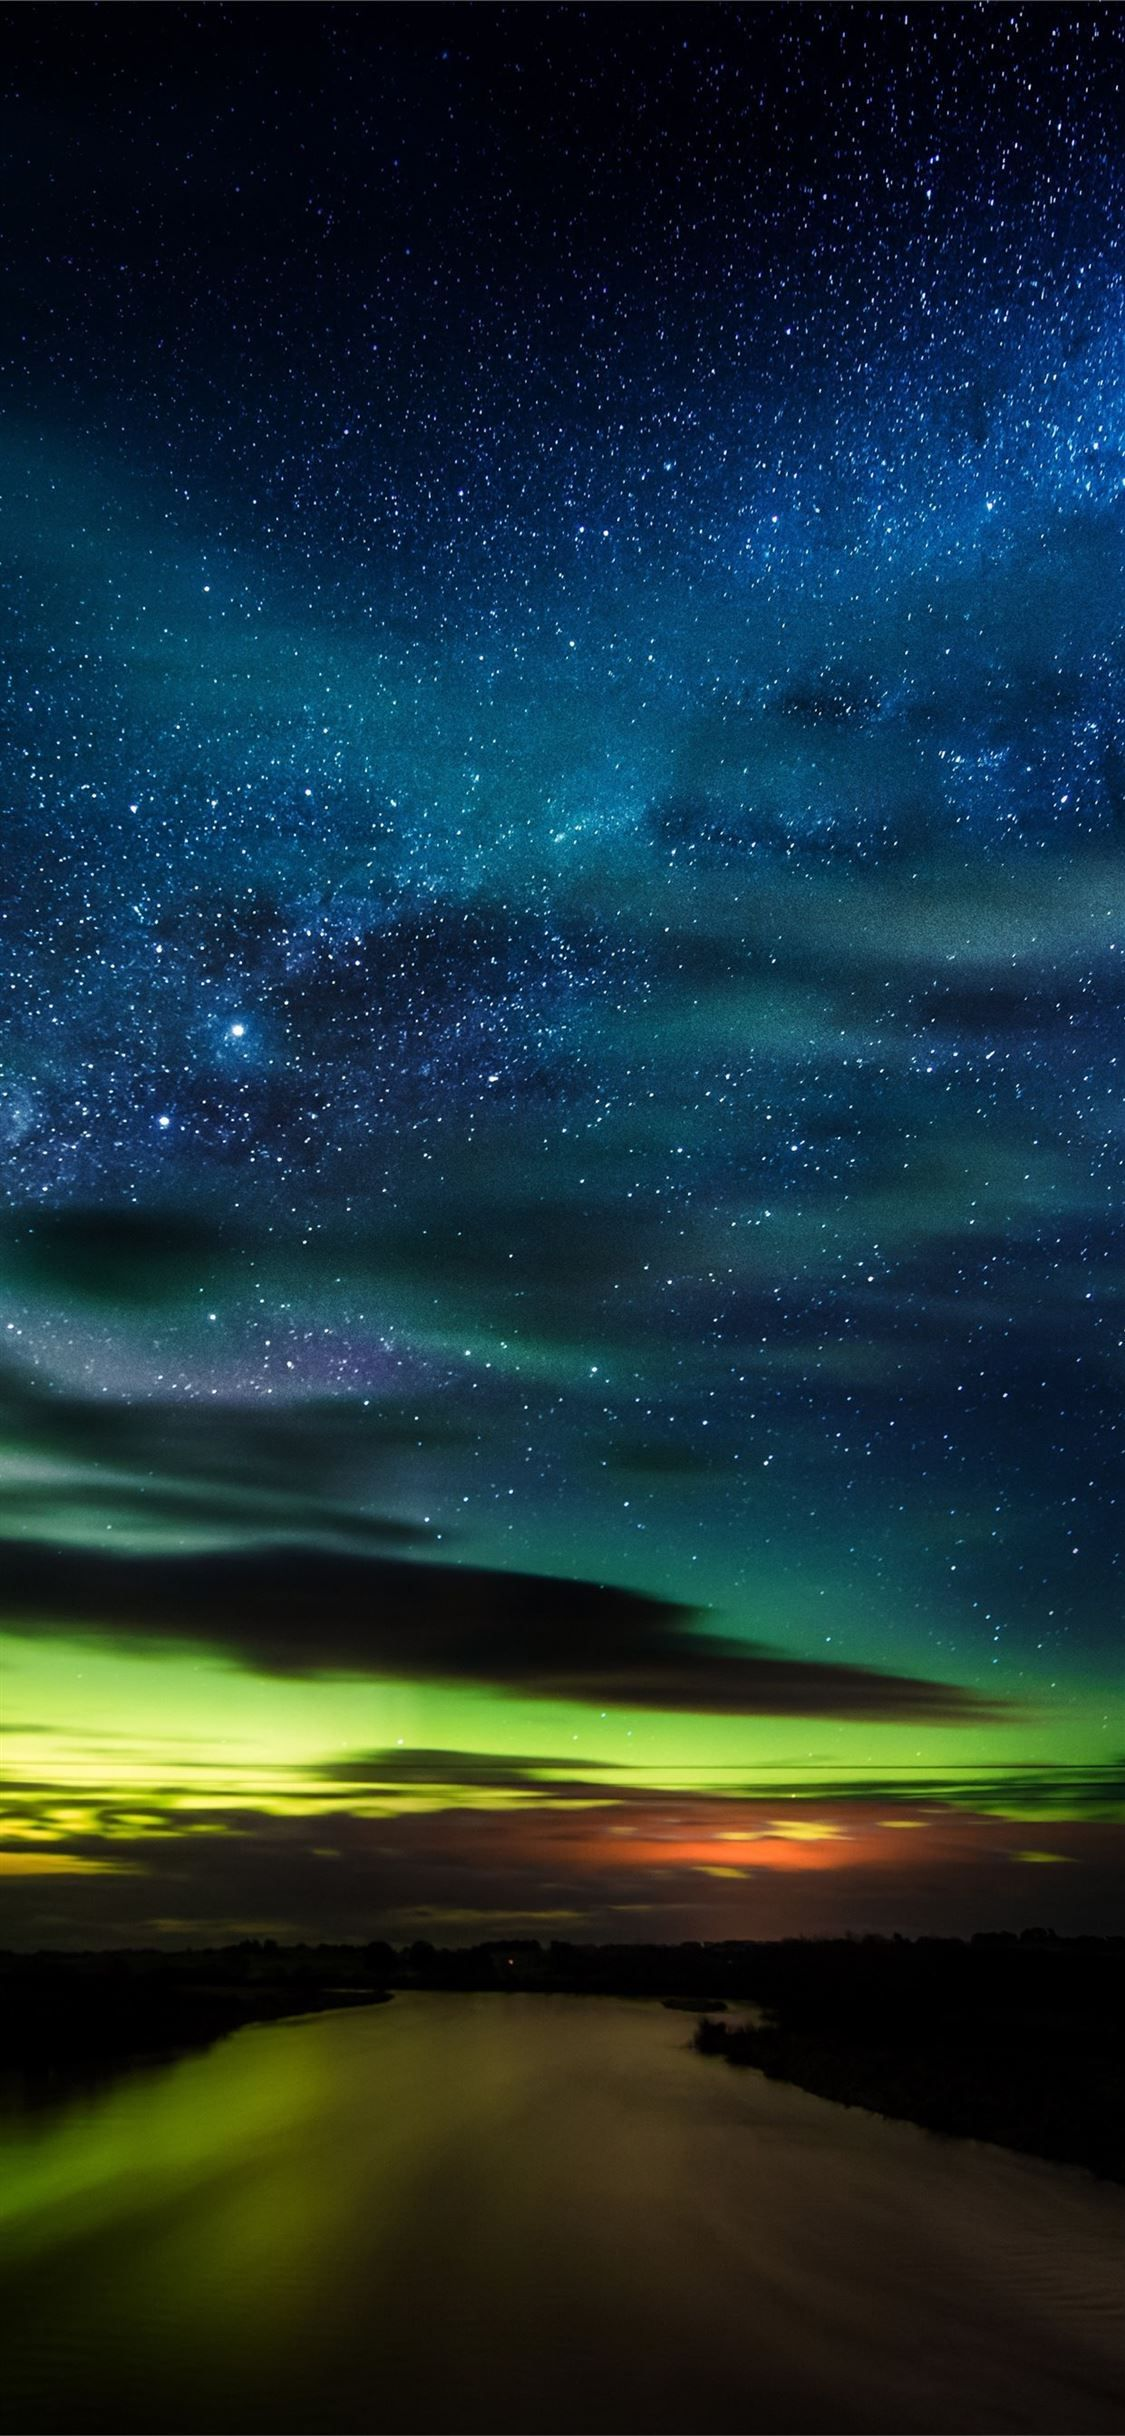 Stars In New Zealand 5k Northernlights Nature Aurora 4k 5k Sky Stars Iphonexwallpaper Northern Lights Wallpaper Wallpaper Iphone X Wallpapers